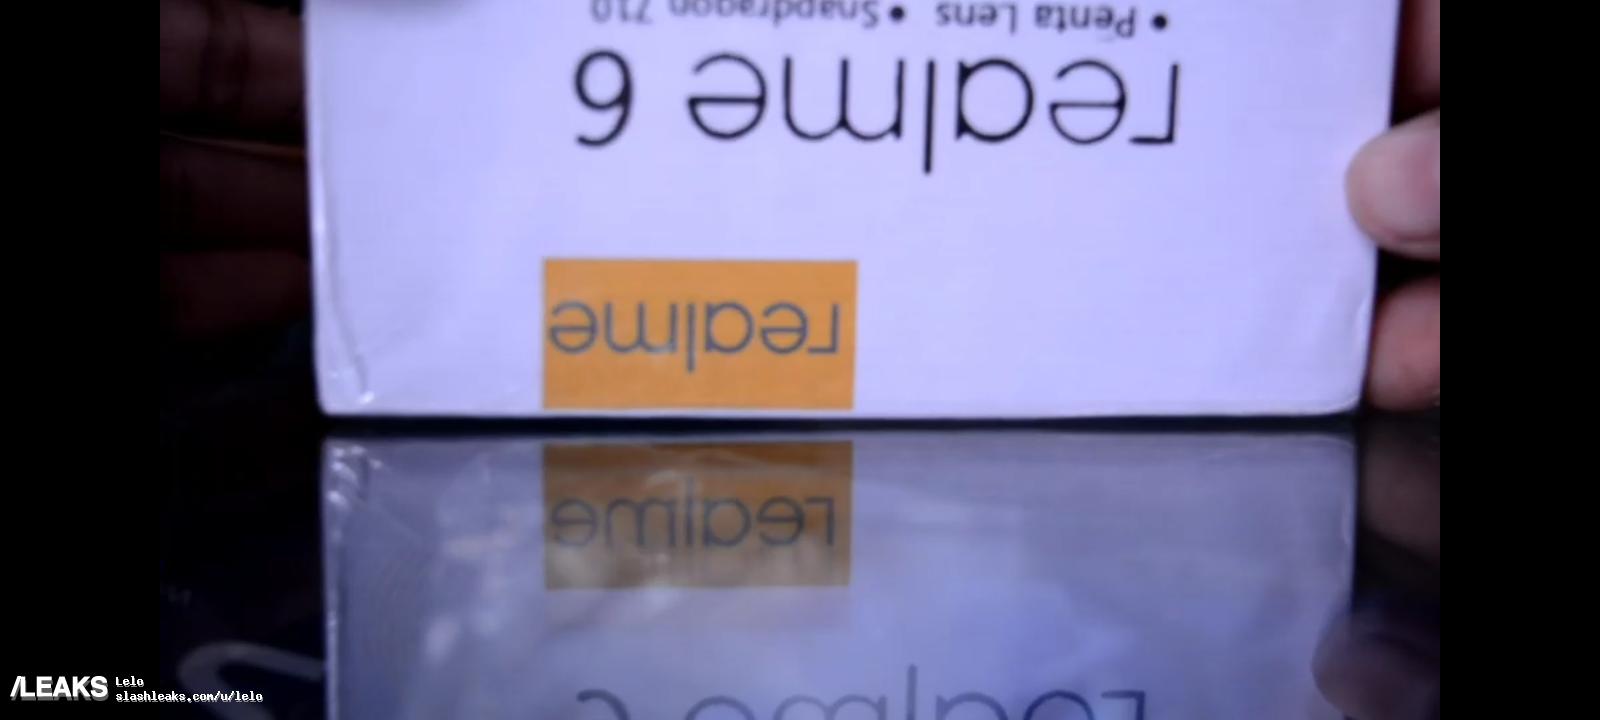 Realme 6 retail box leaked, reveals penta-lens setup and Snapdragon 710